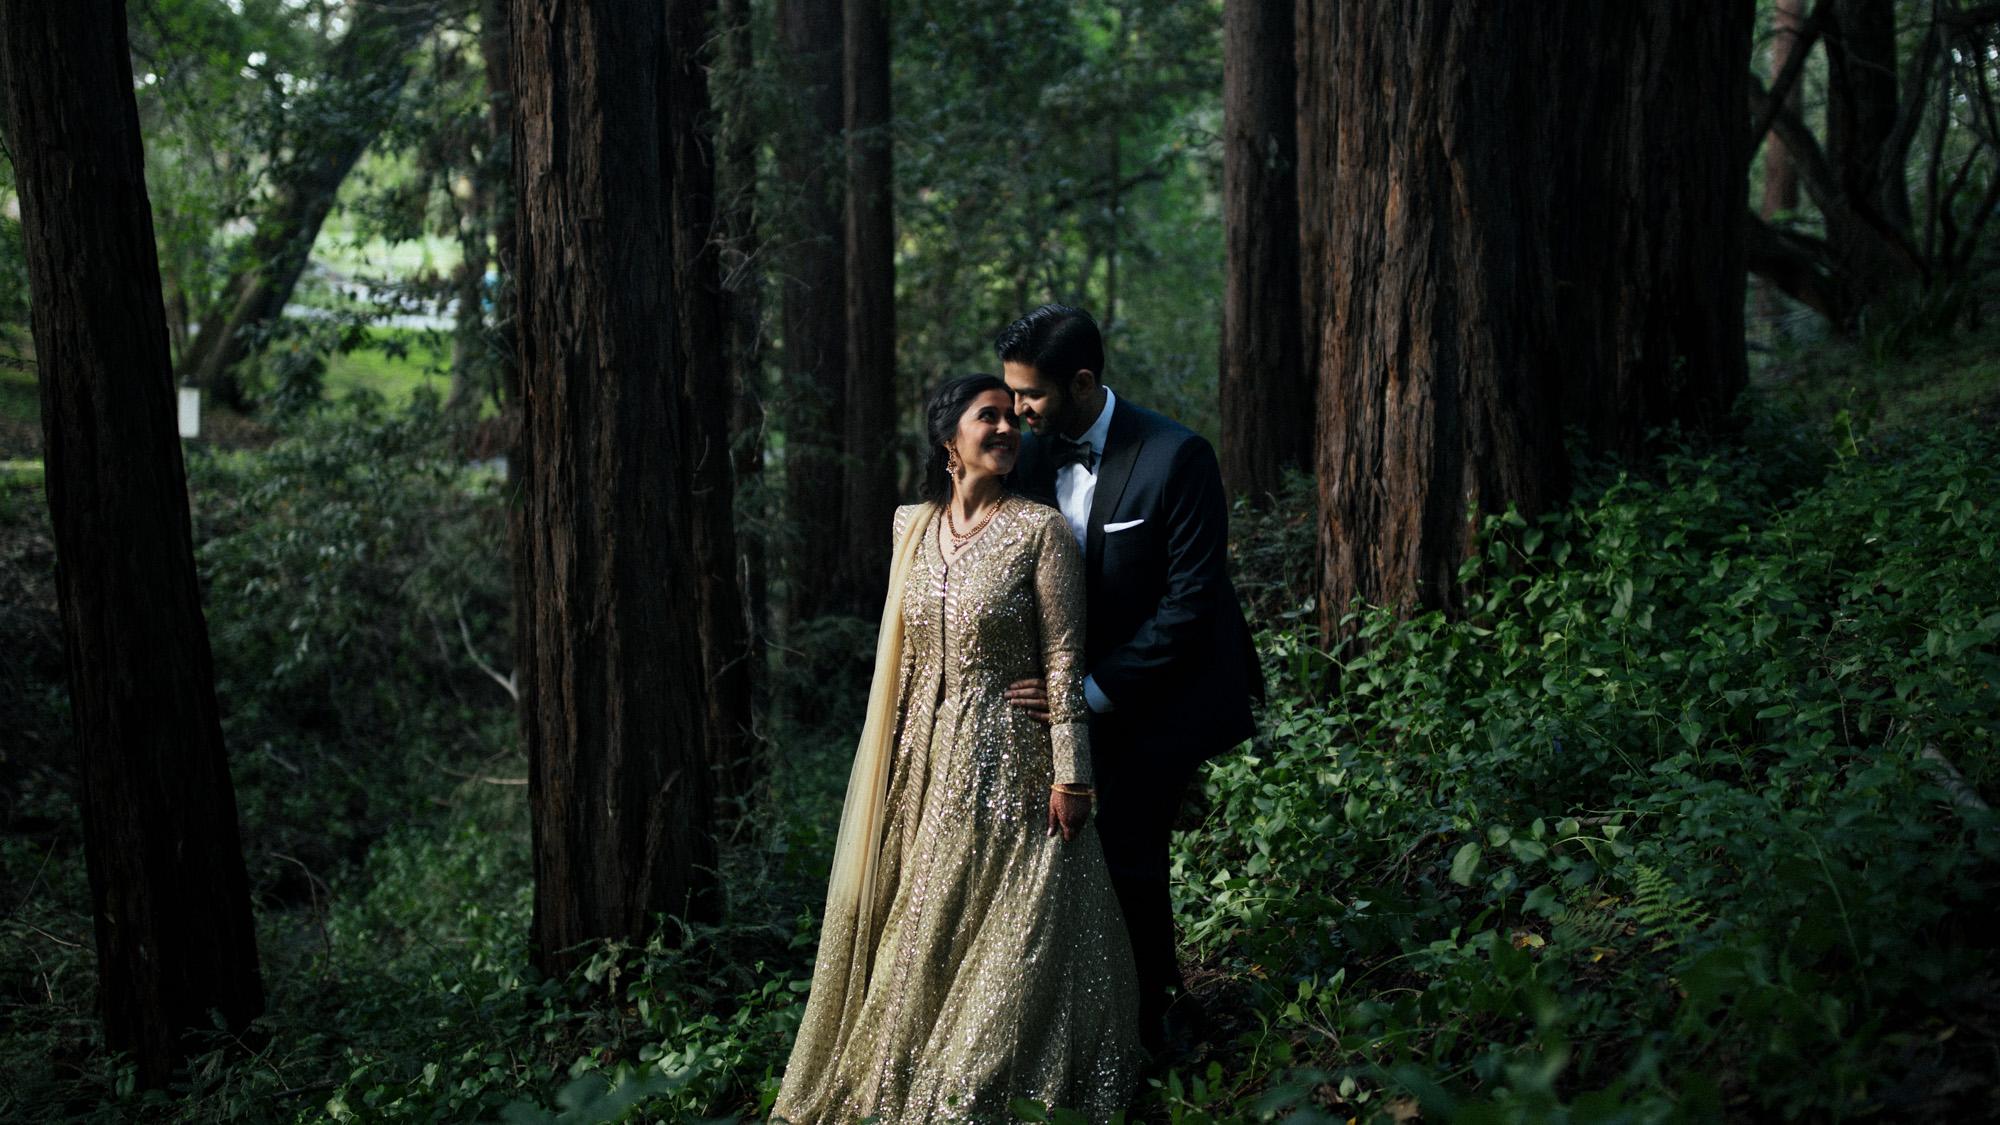 anu_maneesh_alec_vanderboom_Indian_wedding_photography-0149.jpg